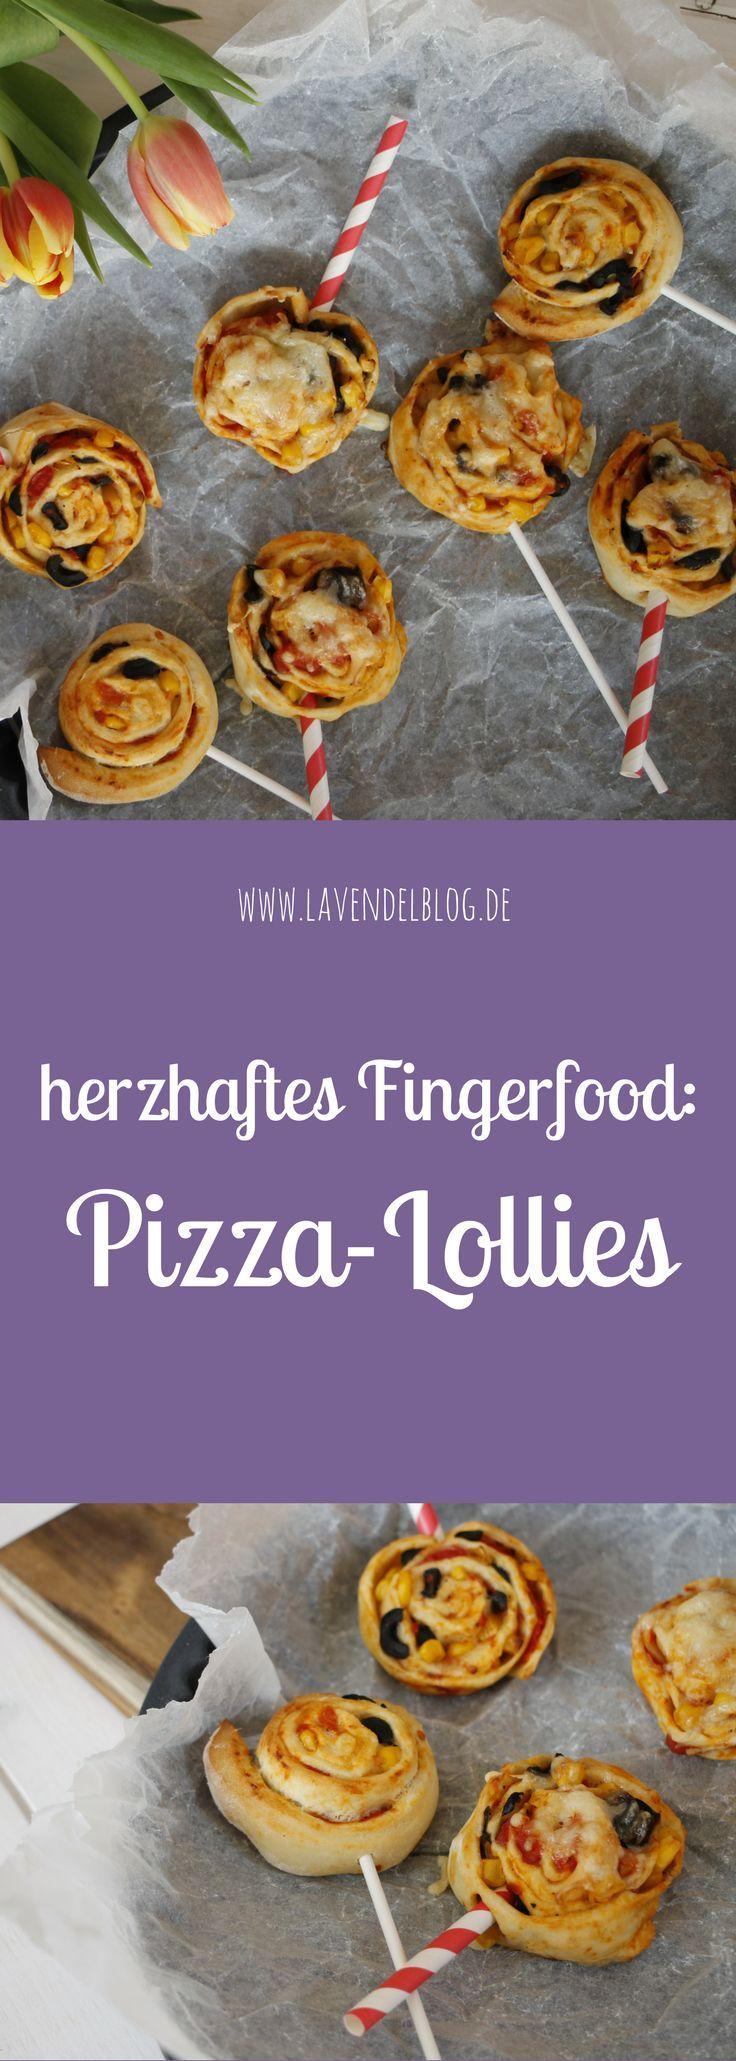 Rezeptidee Kindergeburtstag: Pizza-Lollies #dollies